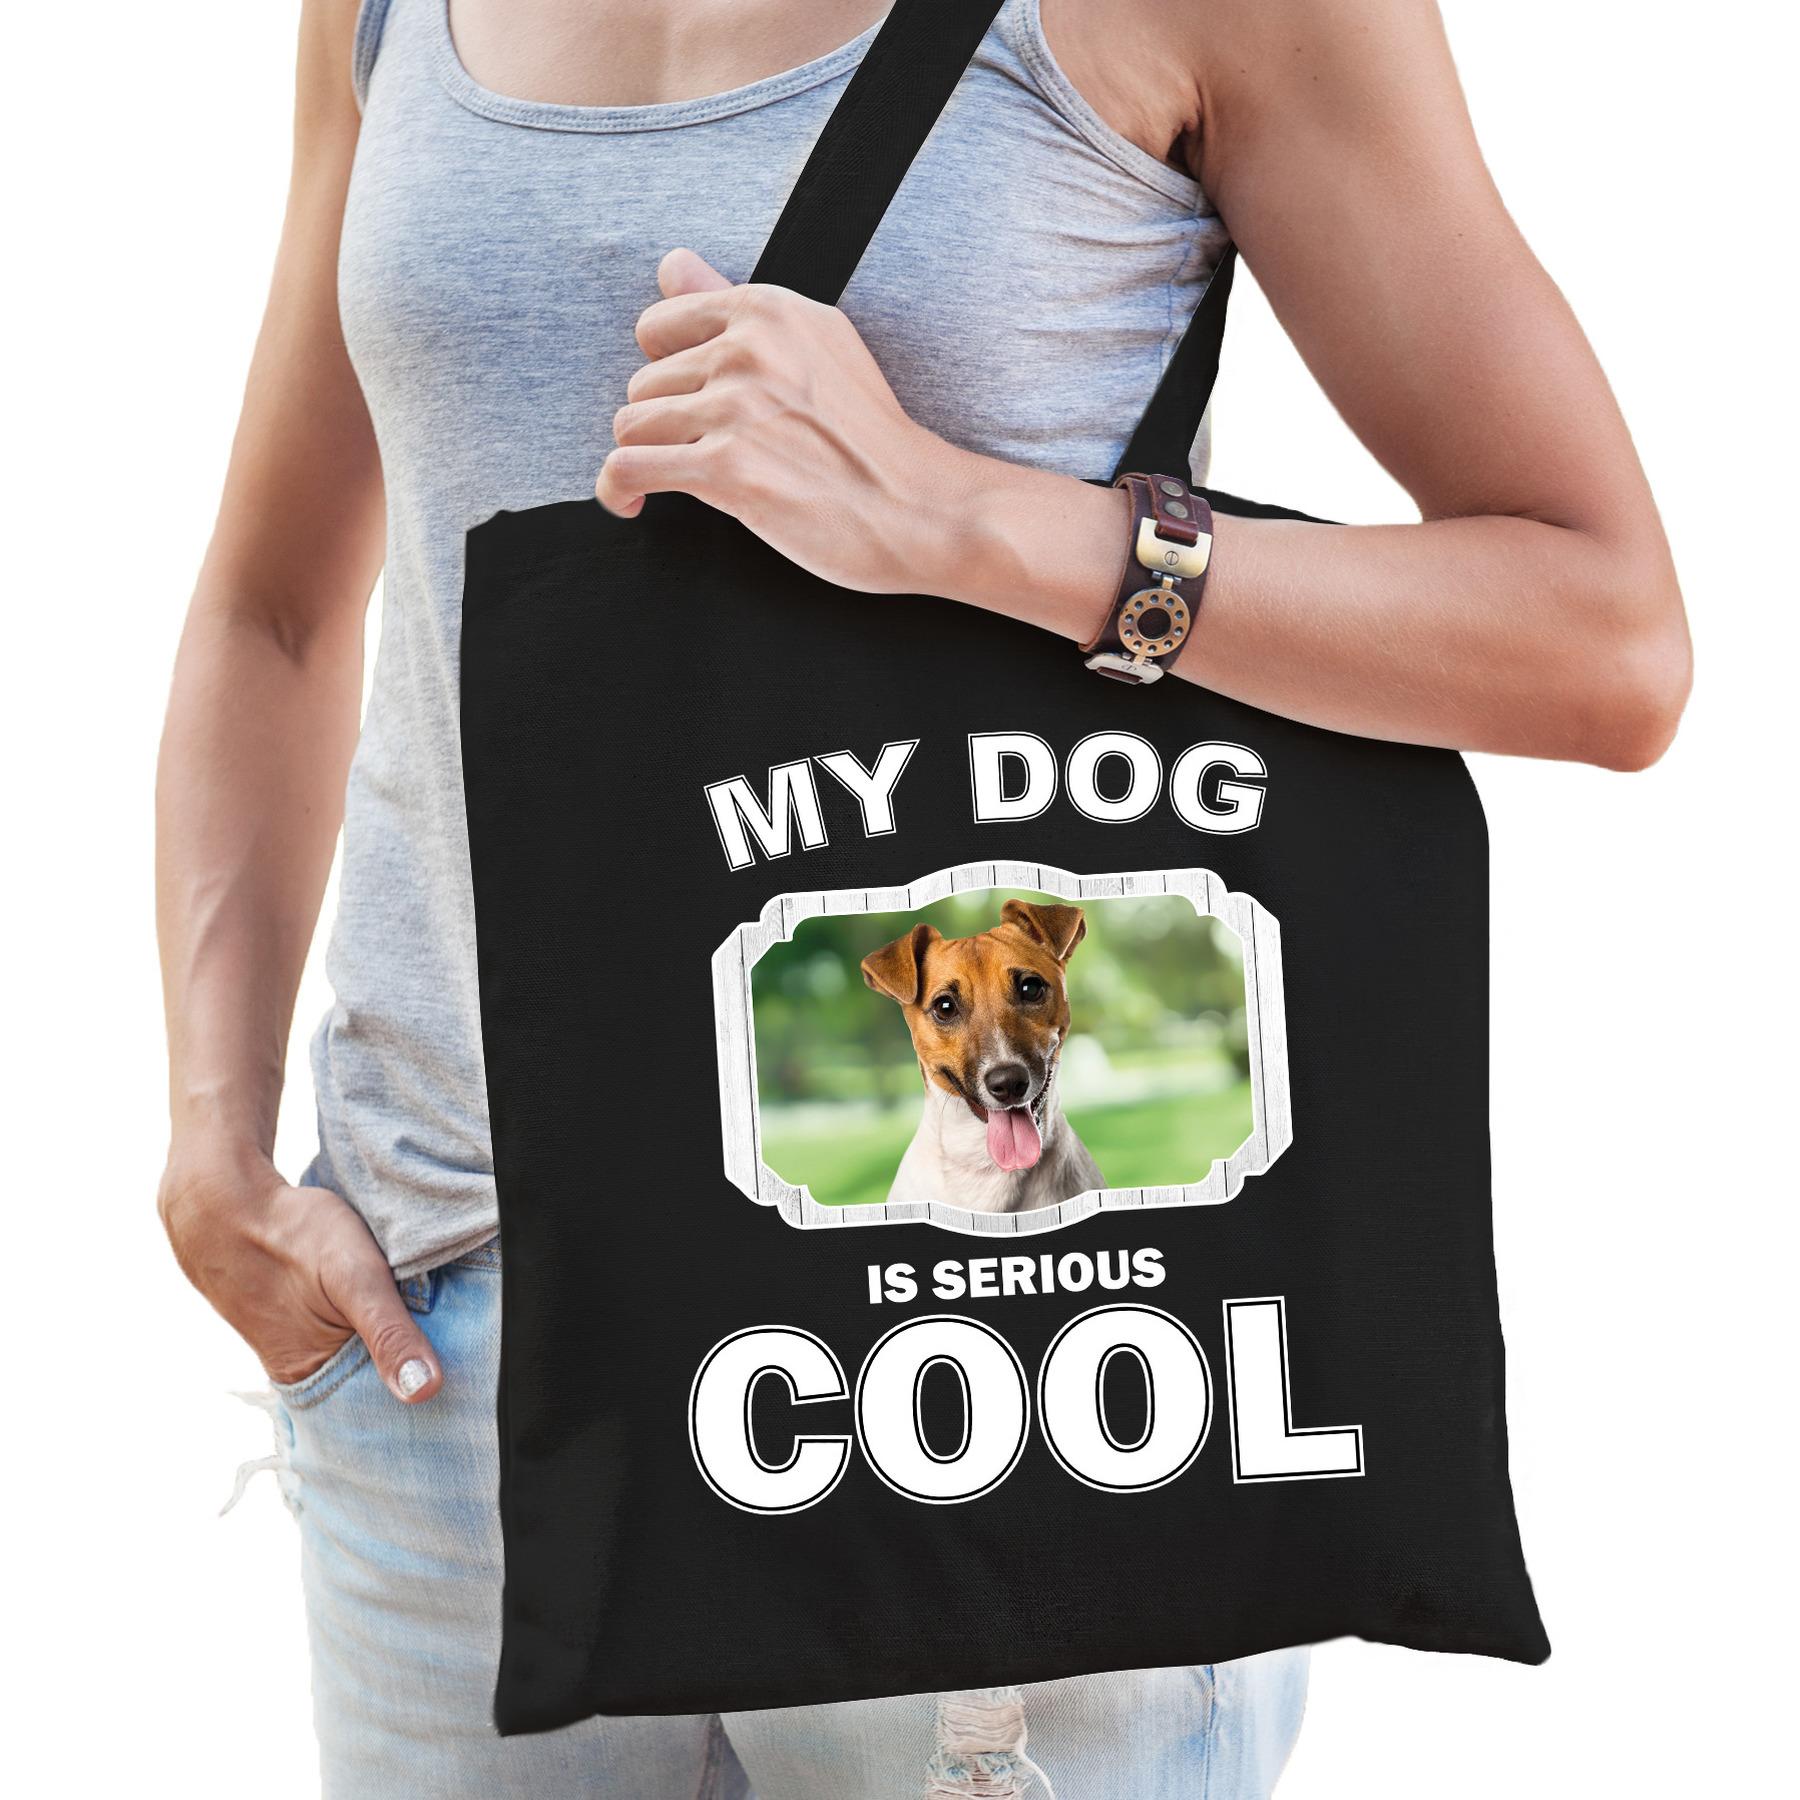 Katoenen tasje my dog is serious cool zwart - Jack russel honden cadeau tas